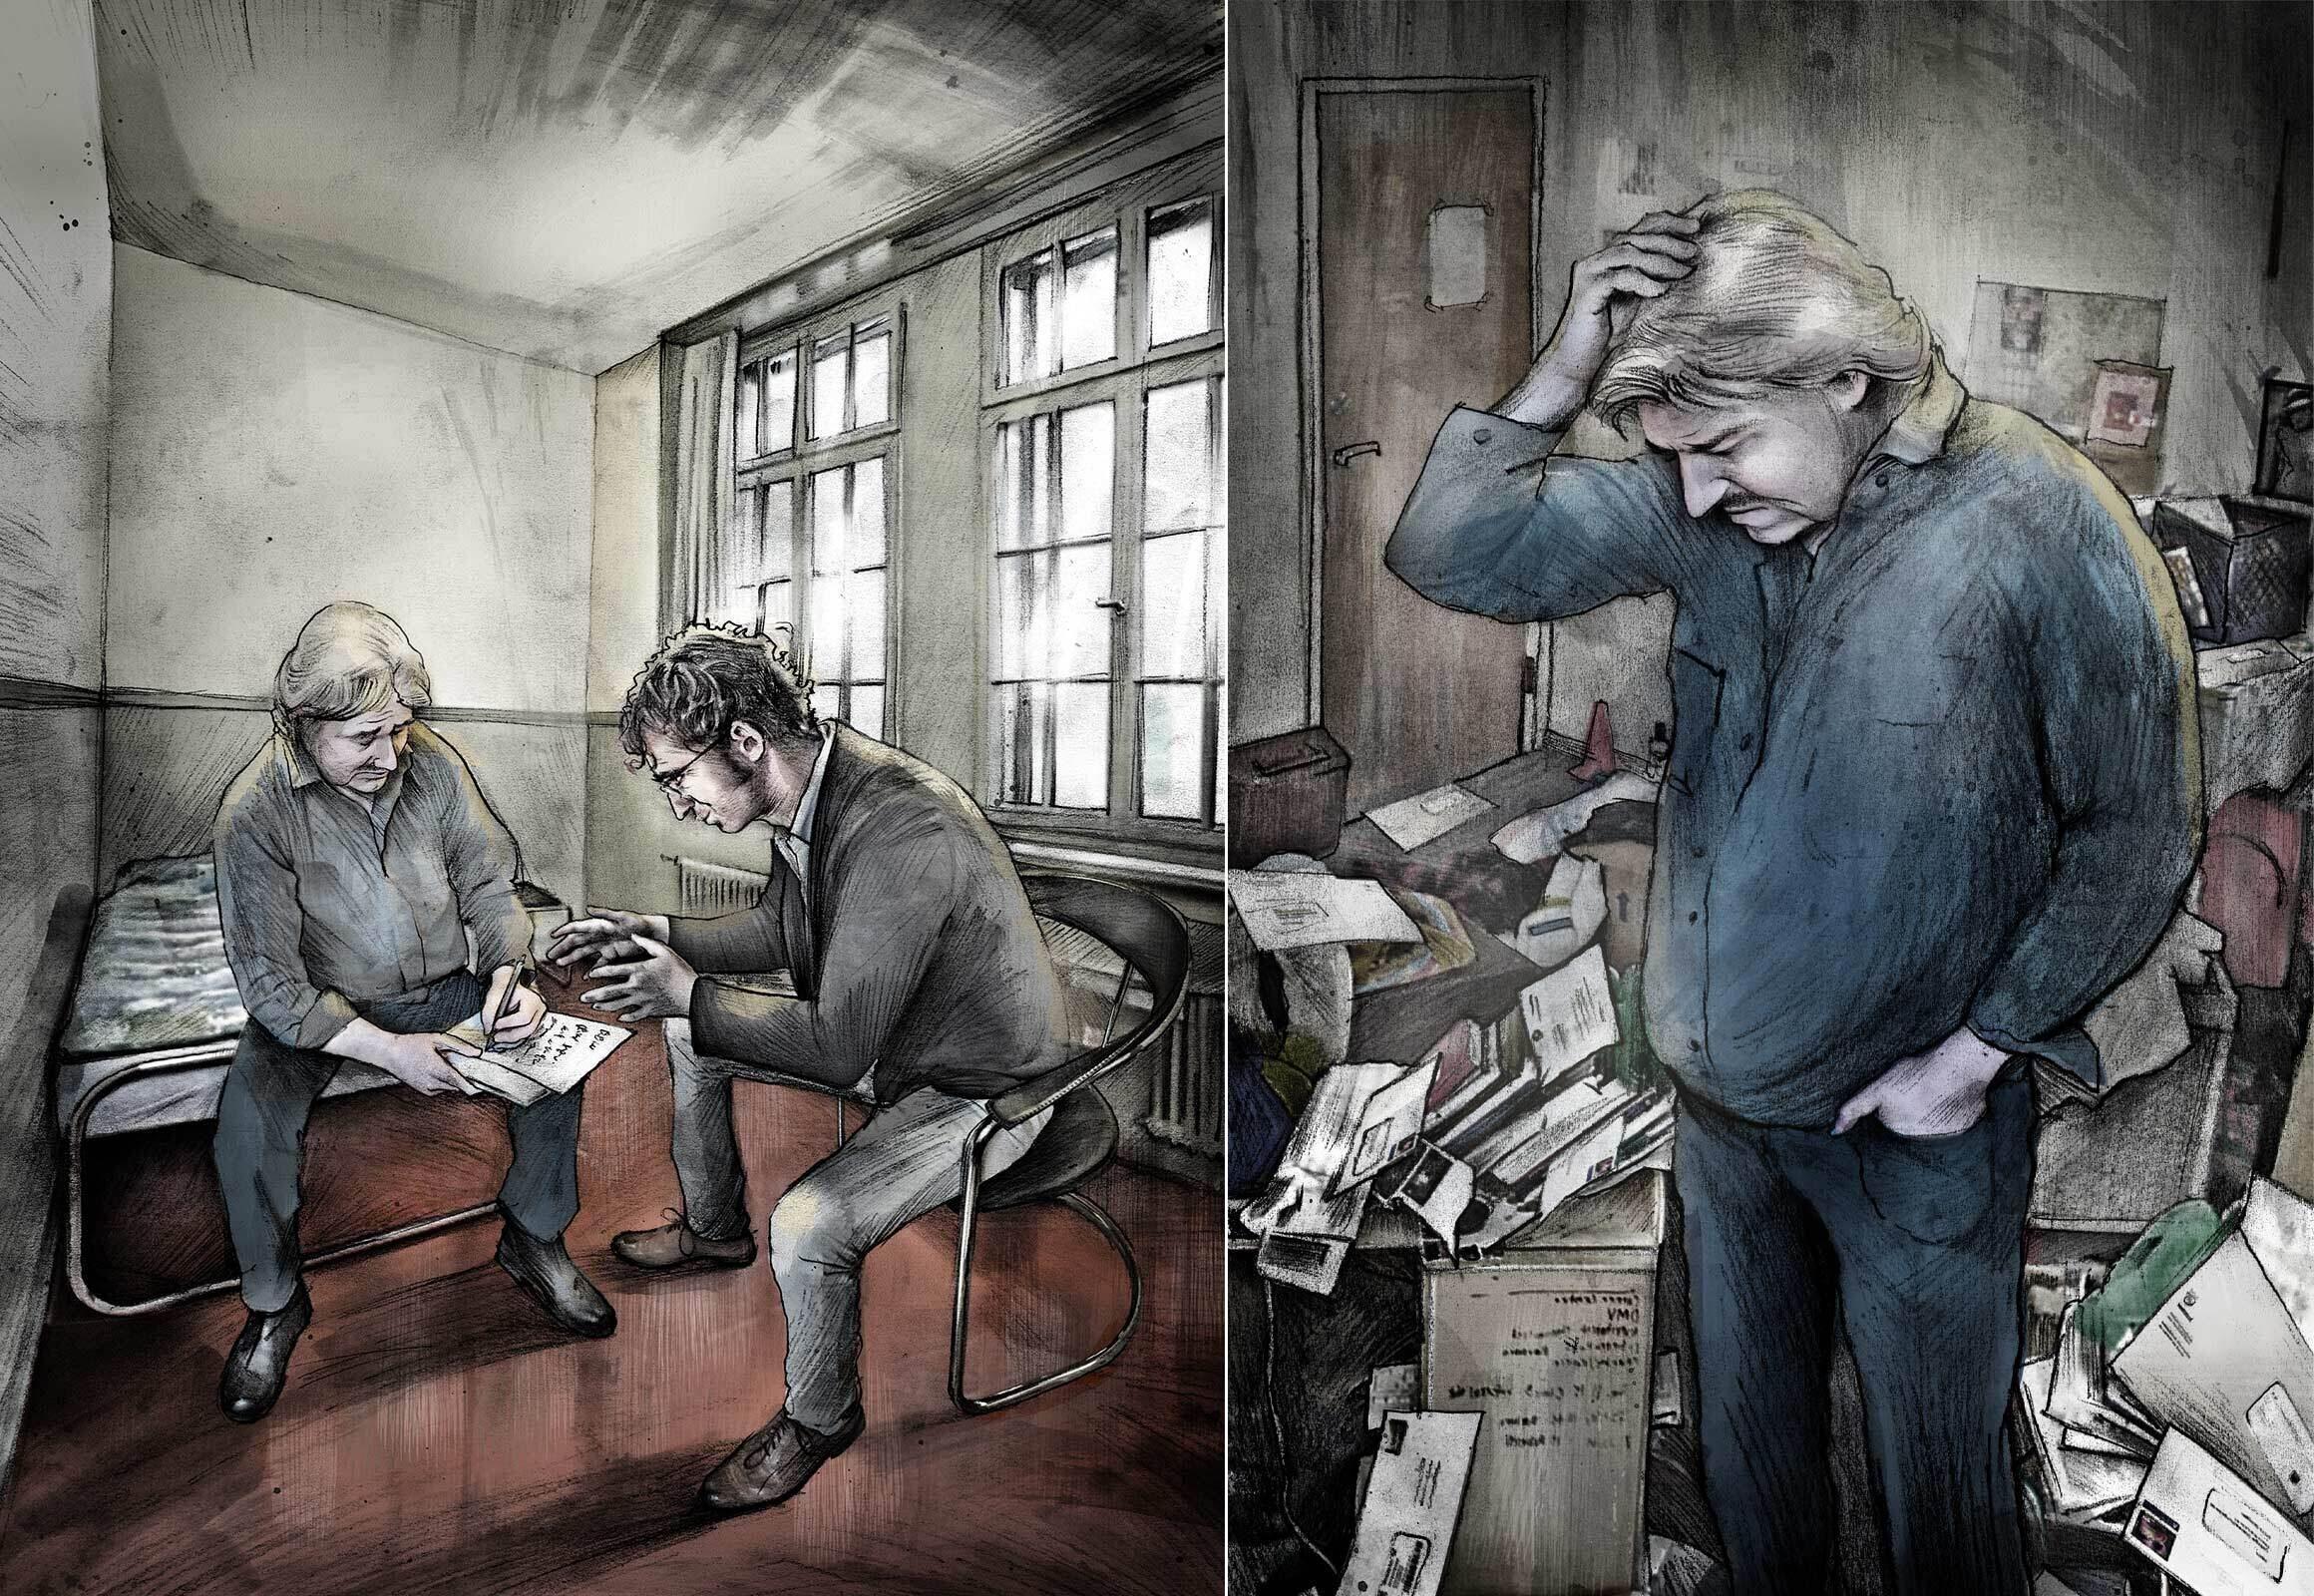 Schulden Existenz Illustration - Kornel Illustration   Kornel Stadler portfolio